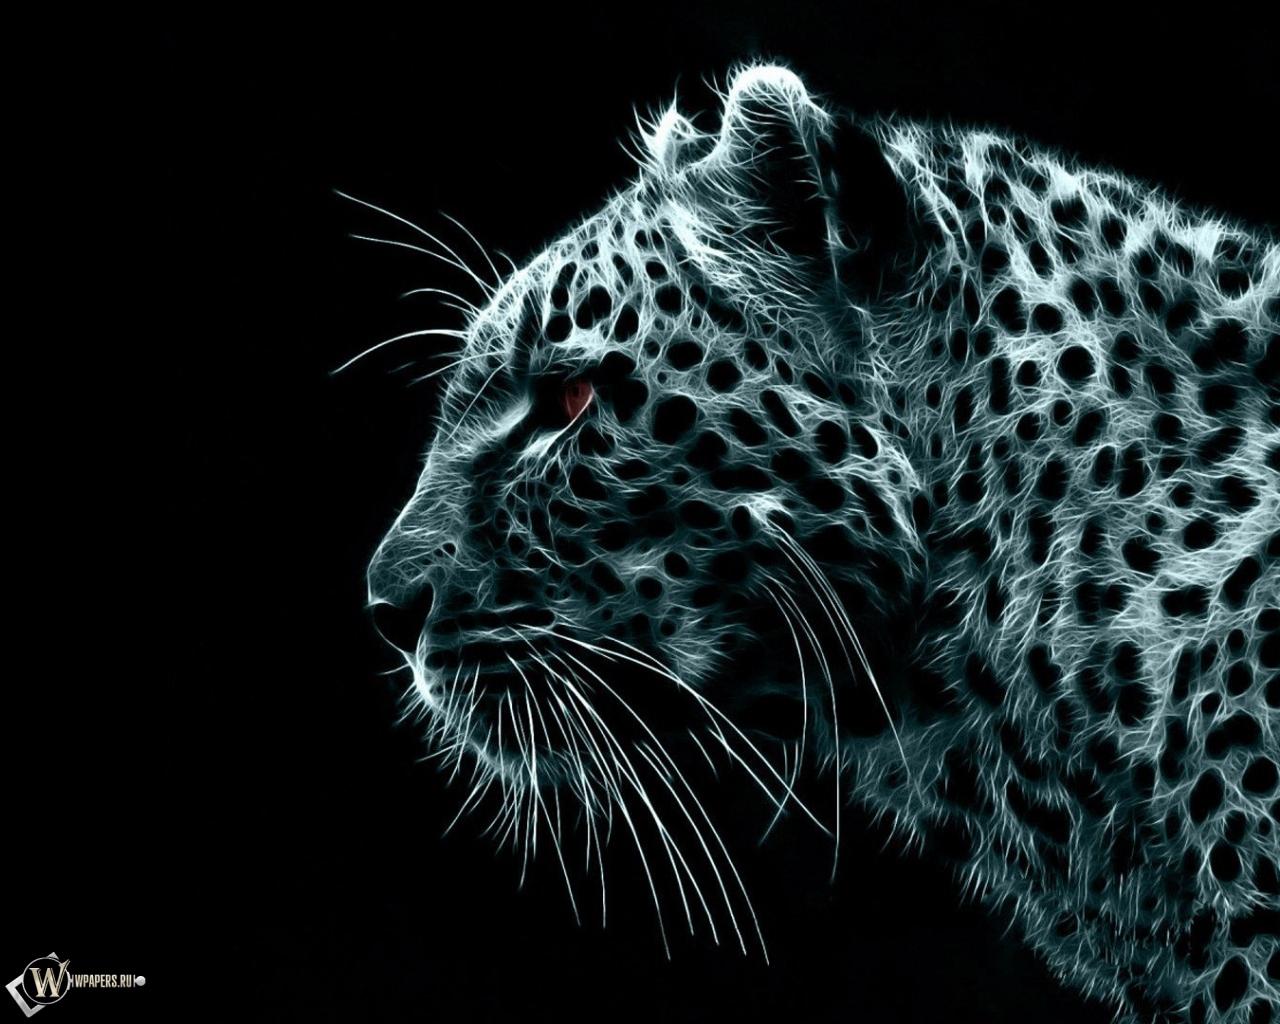 леопард обоев 25 чёрный фон обоев ...: wpapers.ru/wallpapers/animals/Leopards/6341/1280-1024...